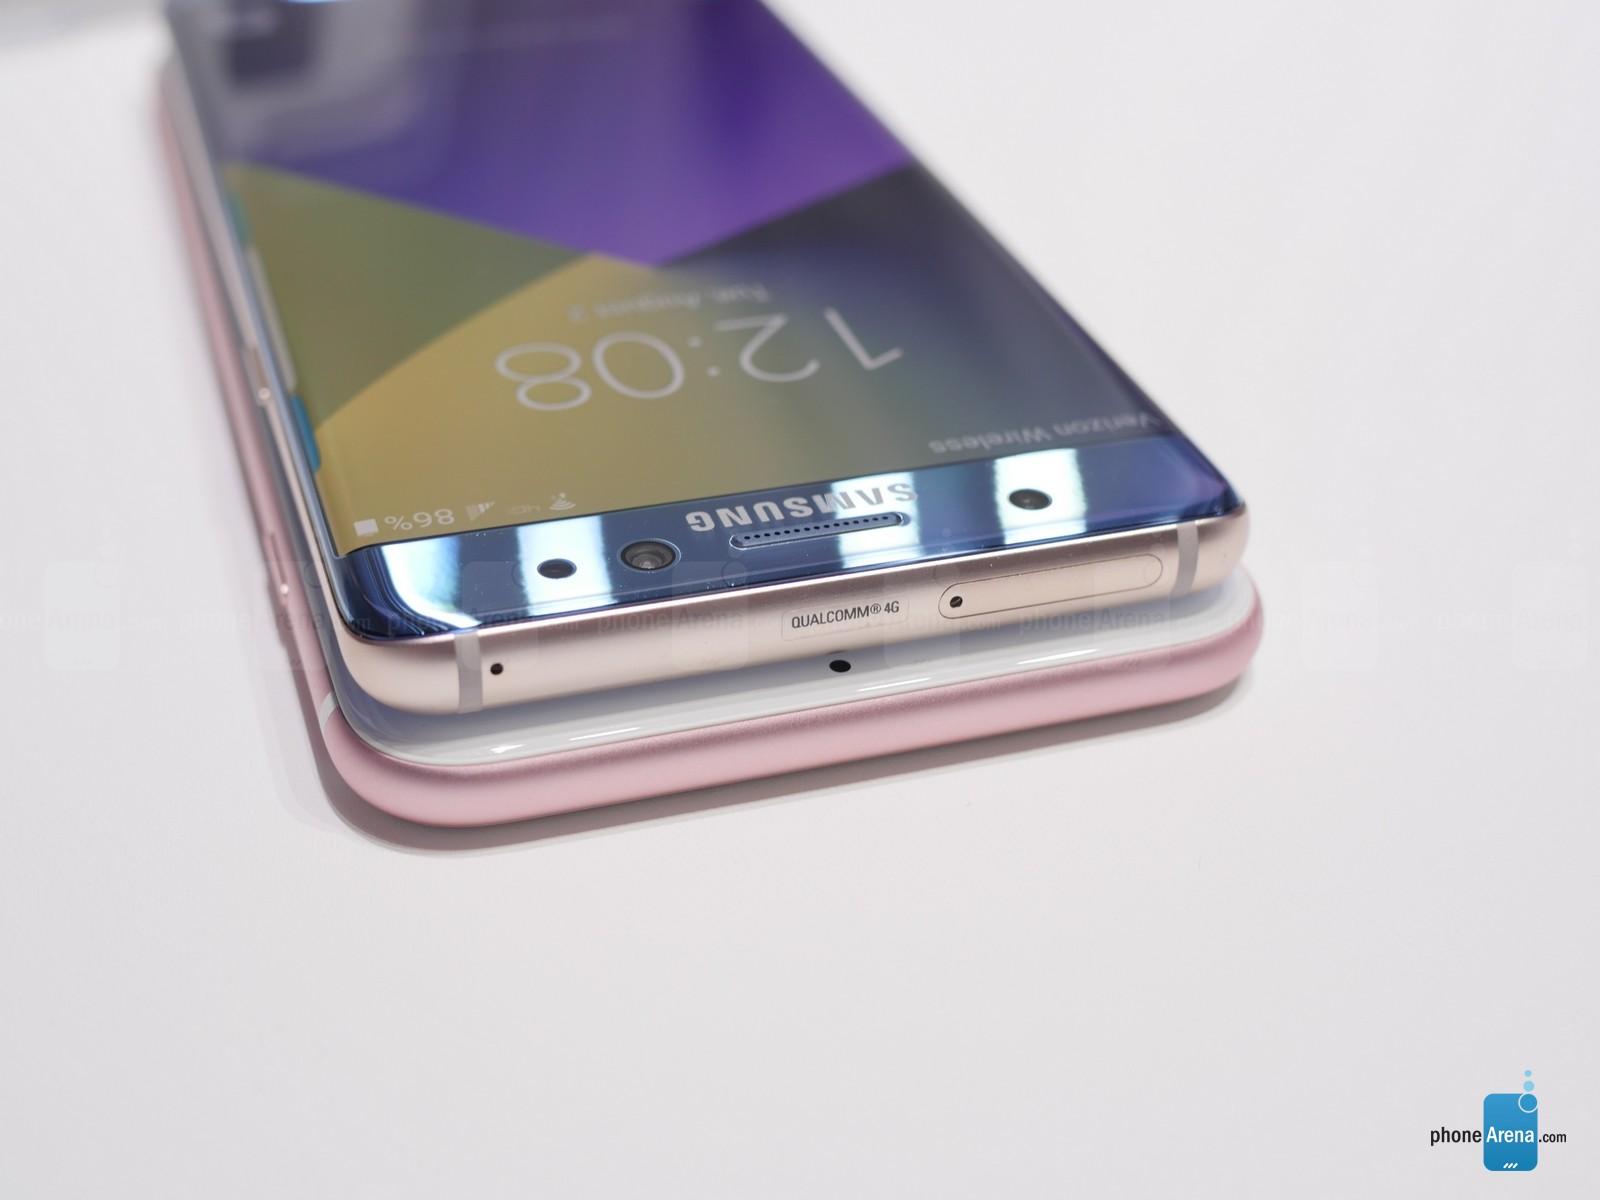 Samsung-Galaxy-Note-7-vs-Apple-iPhonefgfg-6s-Plus